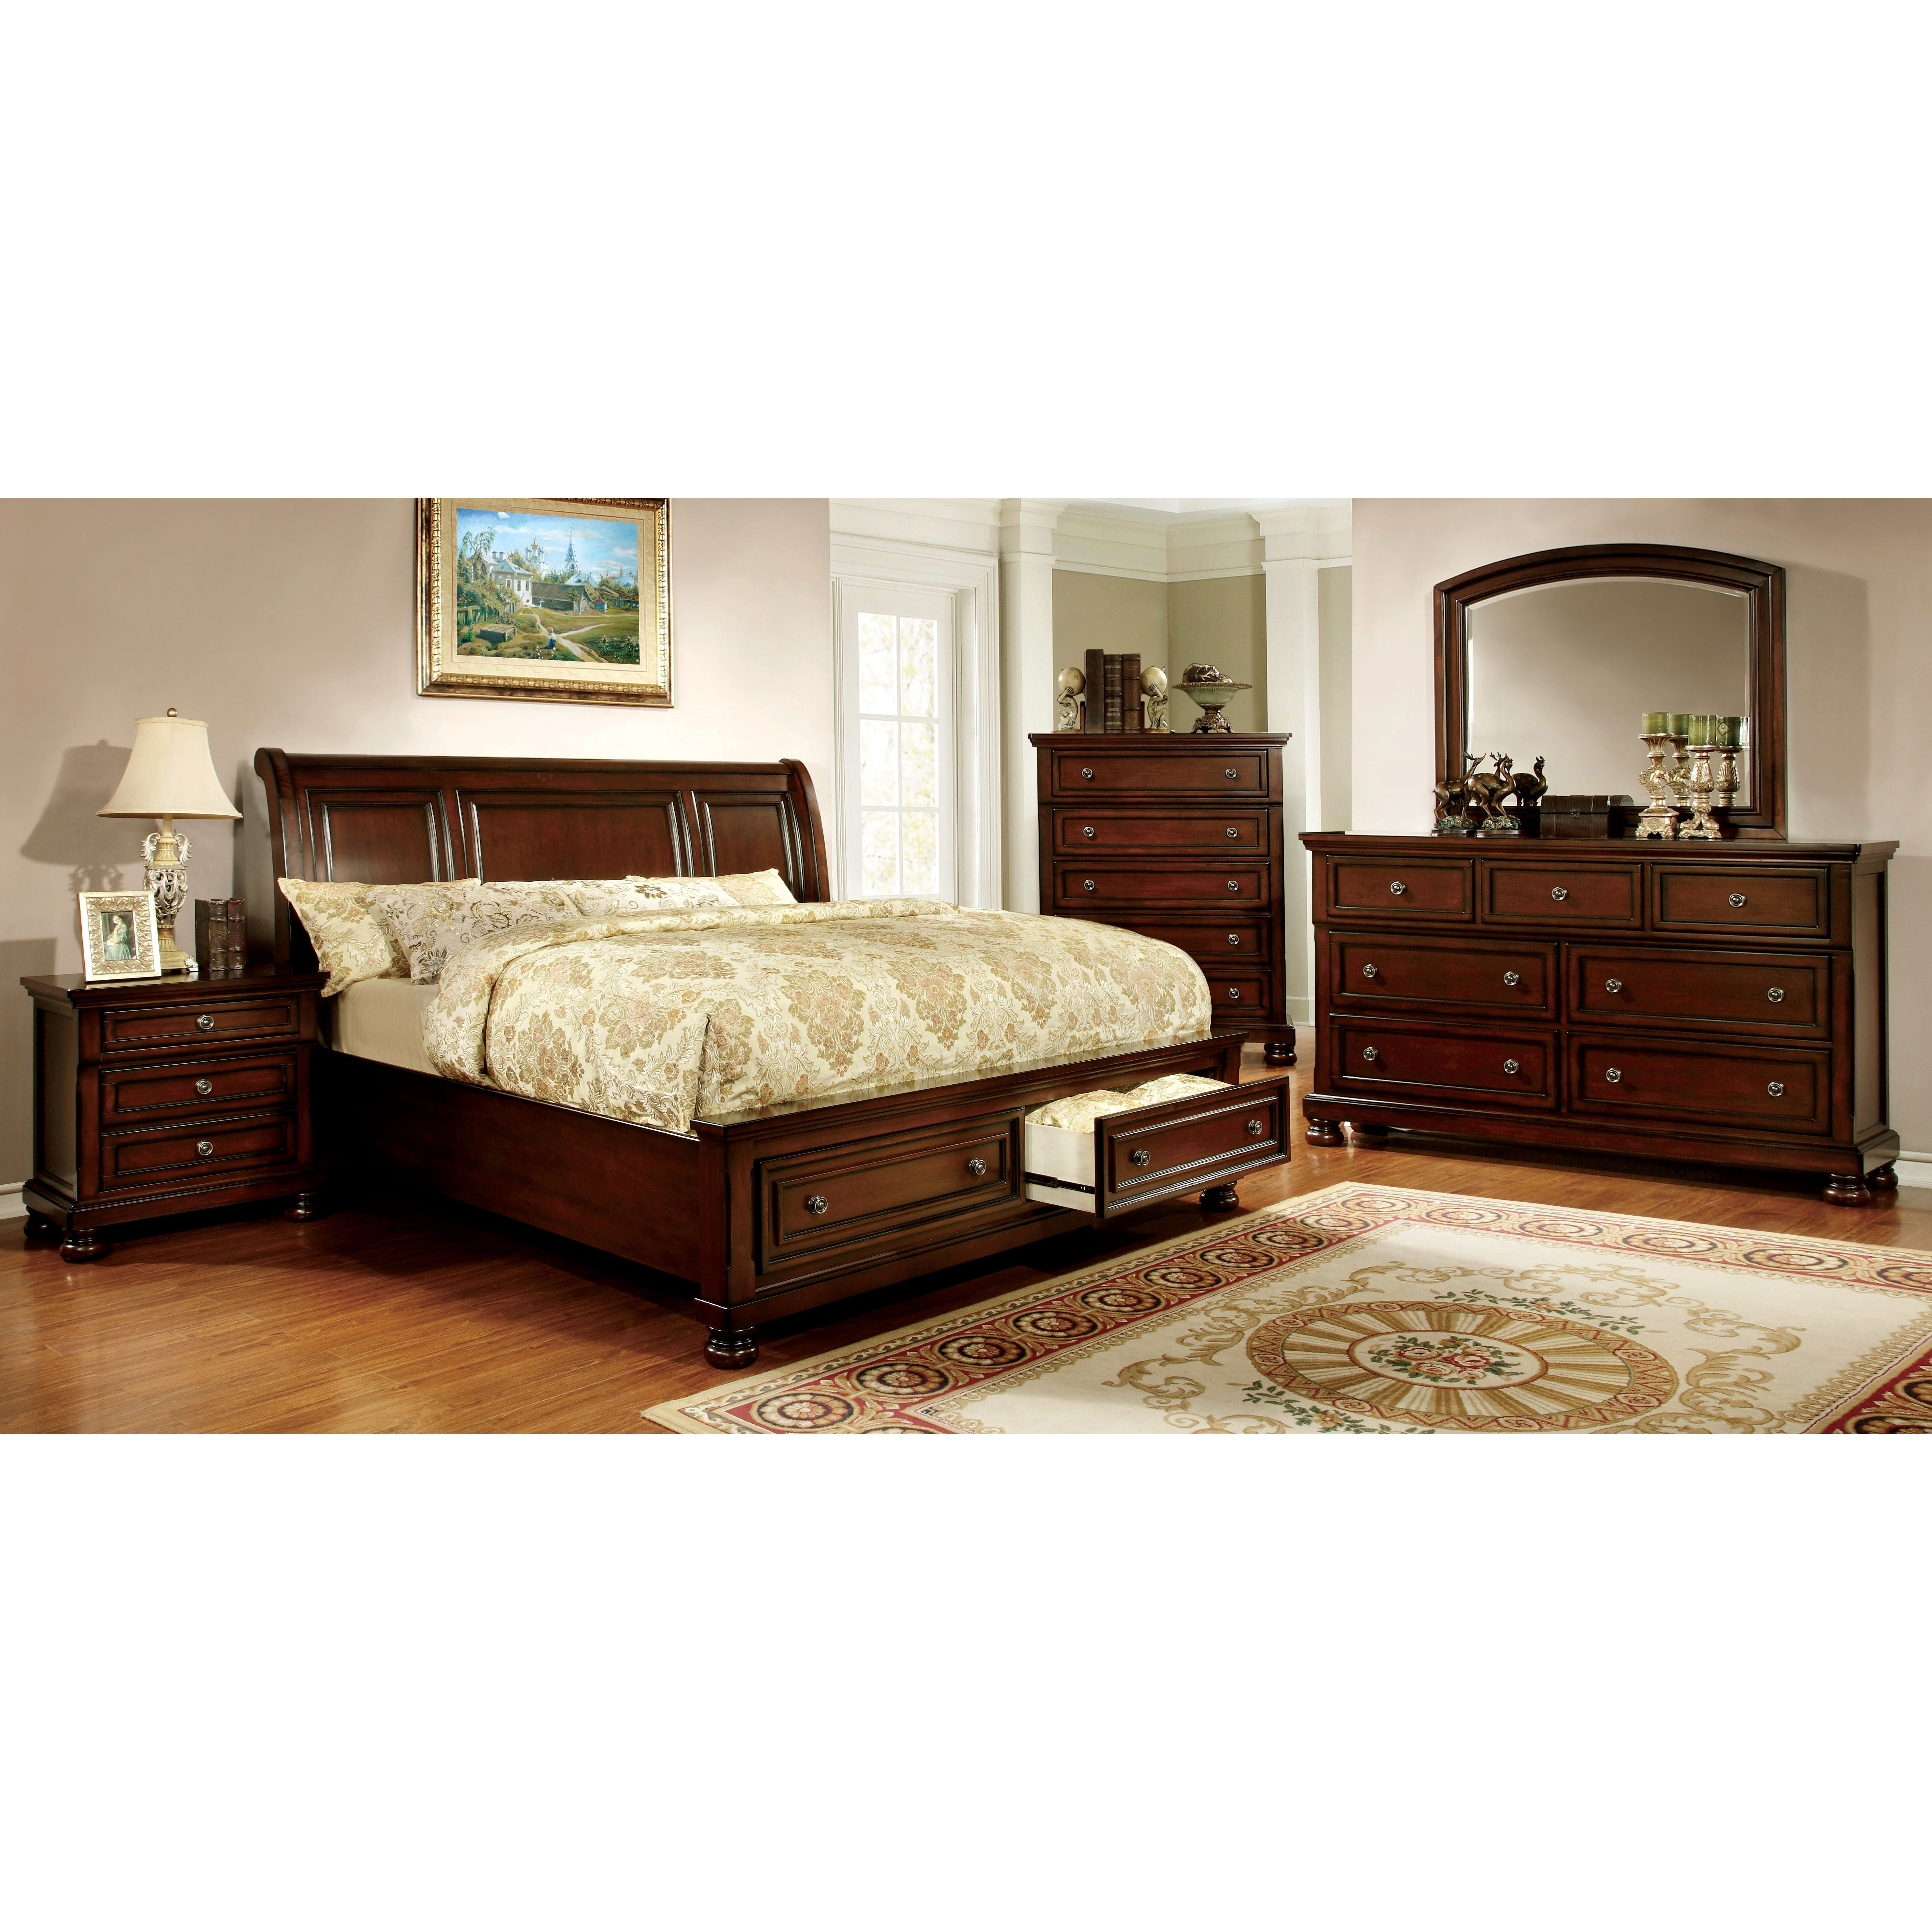 Palma Platform Customizable Bedroom Set  California King Bedroom Sets You  ll Love Wayfair. Bedroom Furniture Sets Tulsa Tulsa  Ok